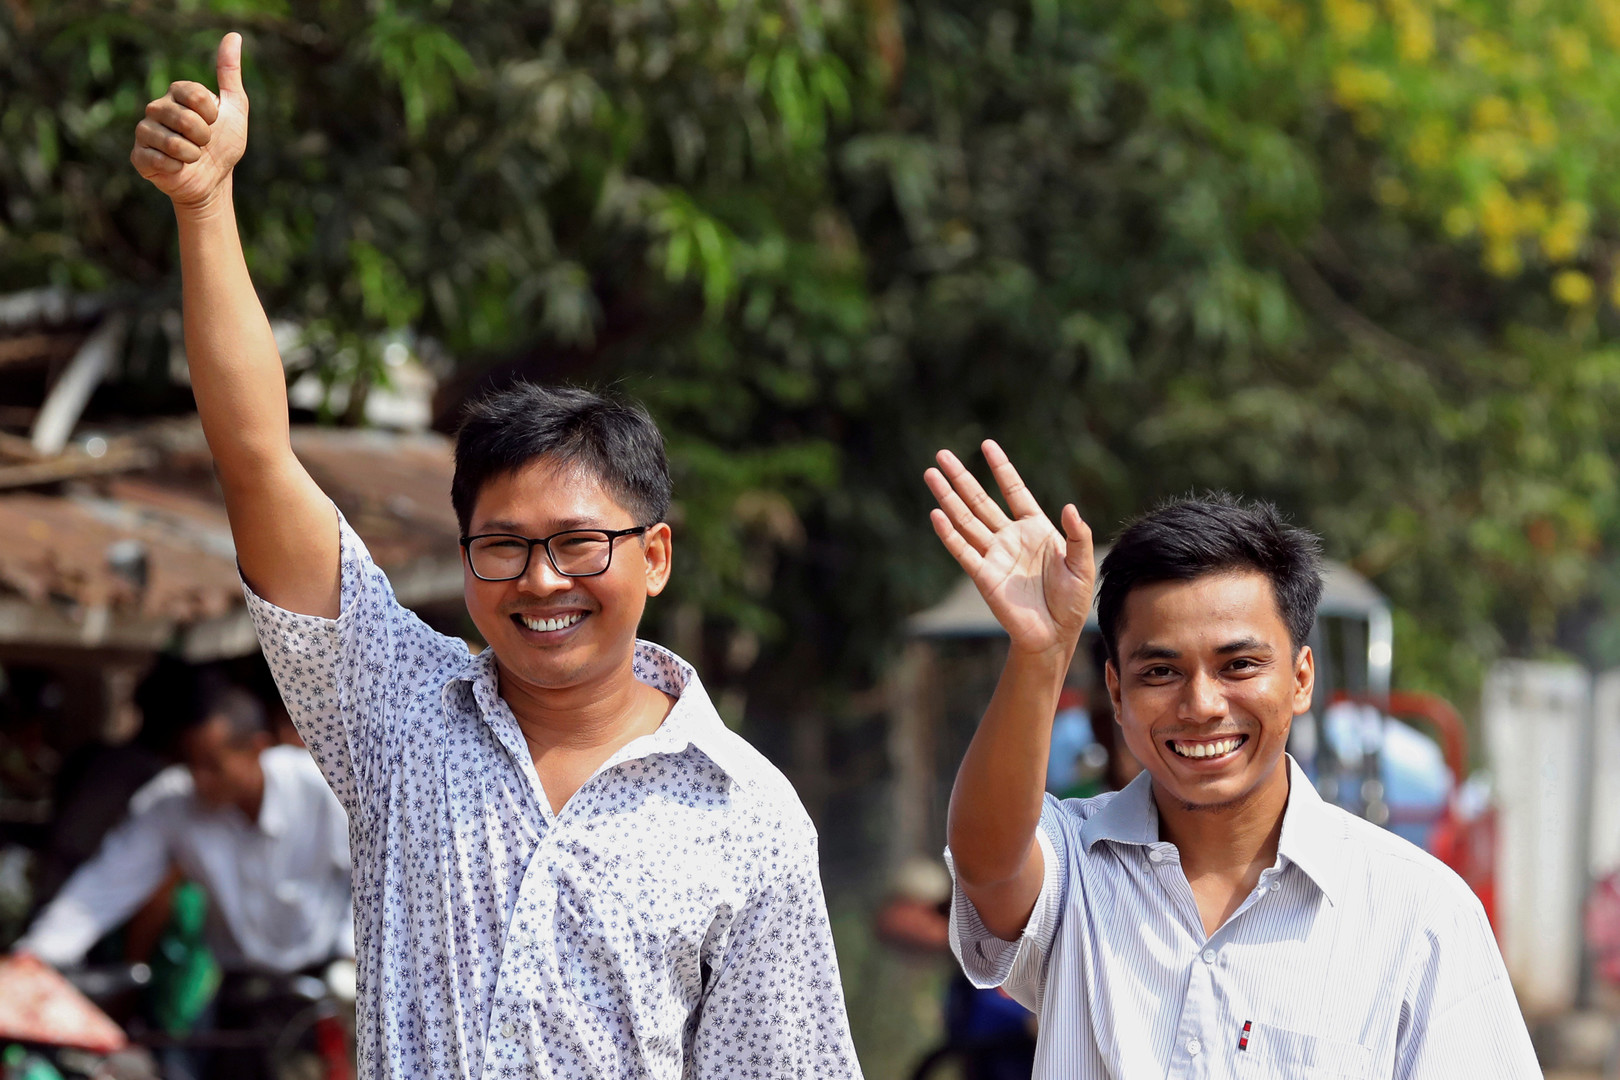 إطلاق سراح صحفيي